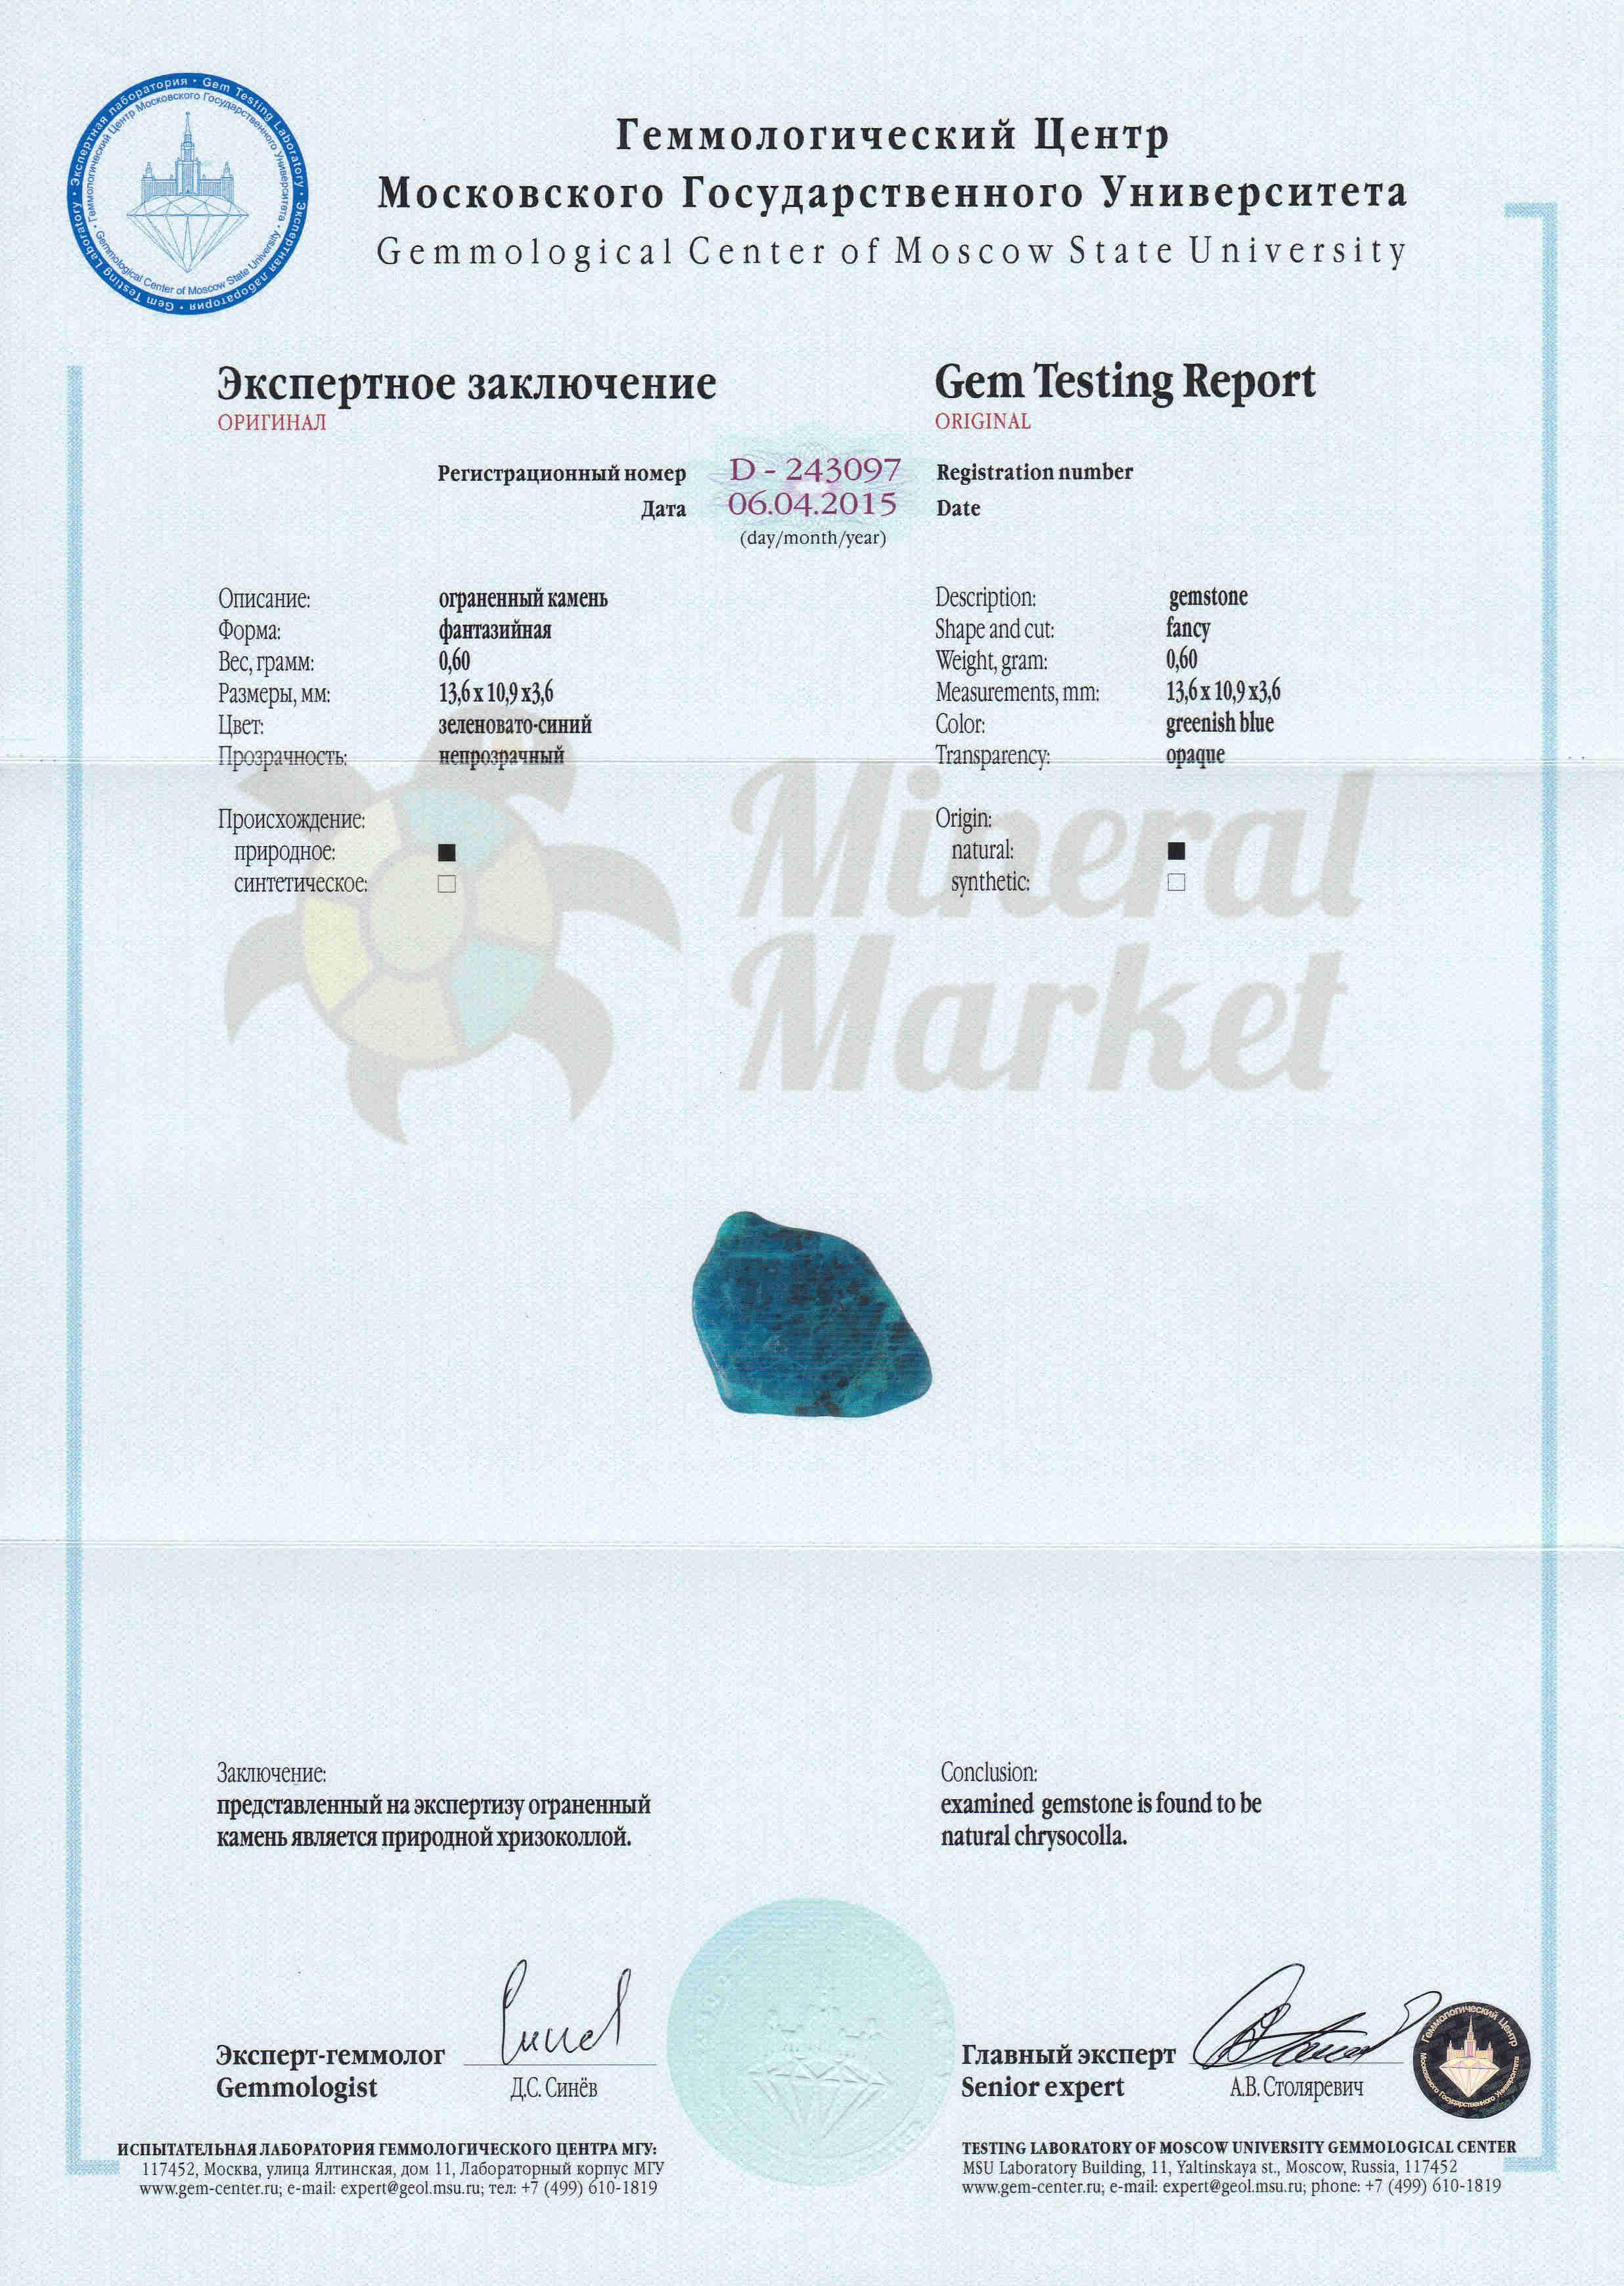 https://mineralmarket.ru/img/certificate/133/133.jpg